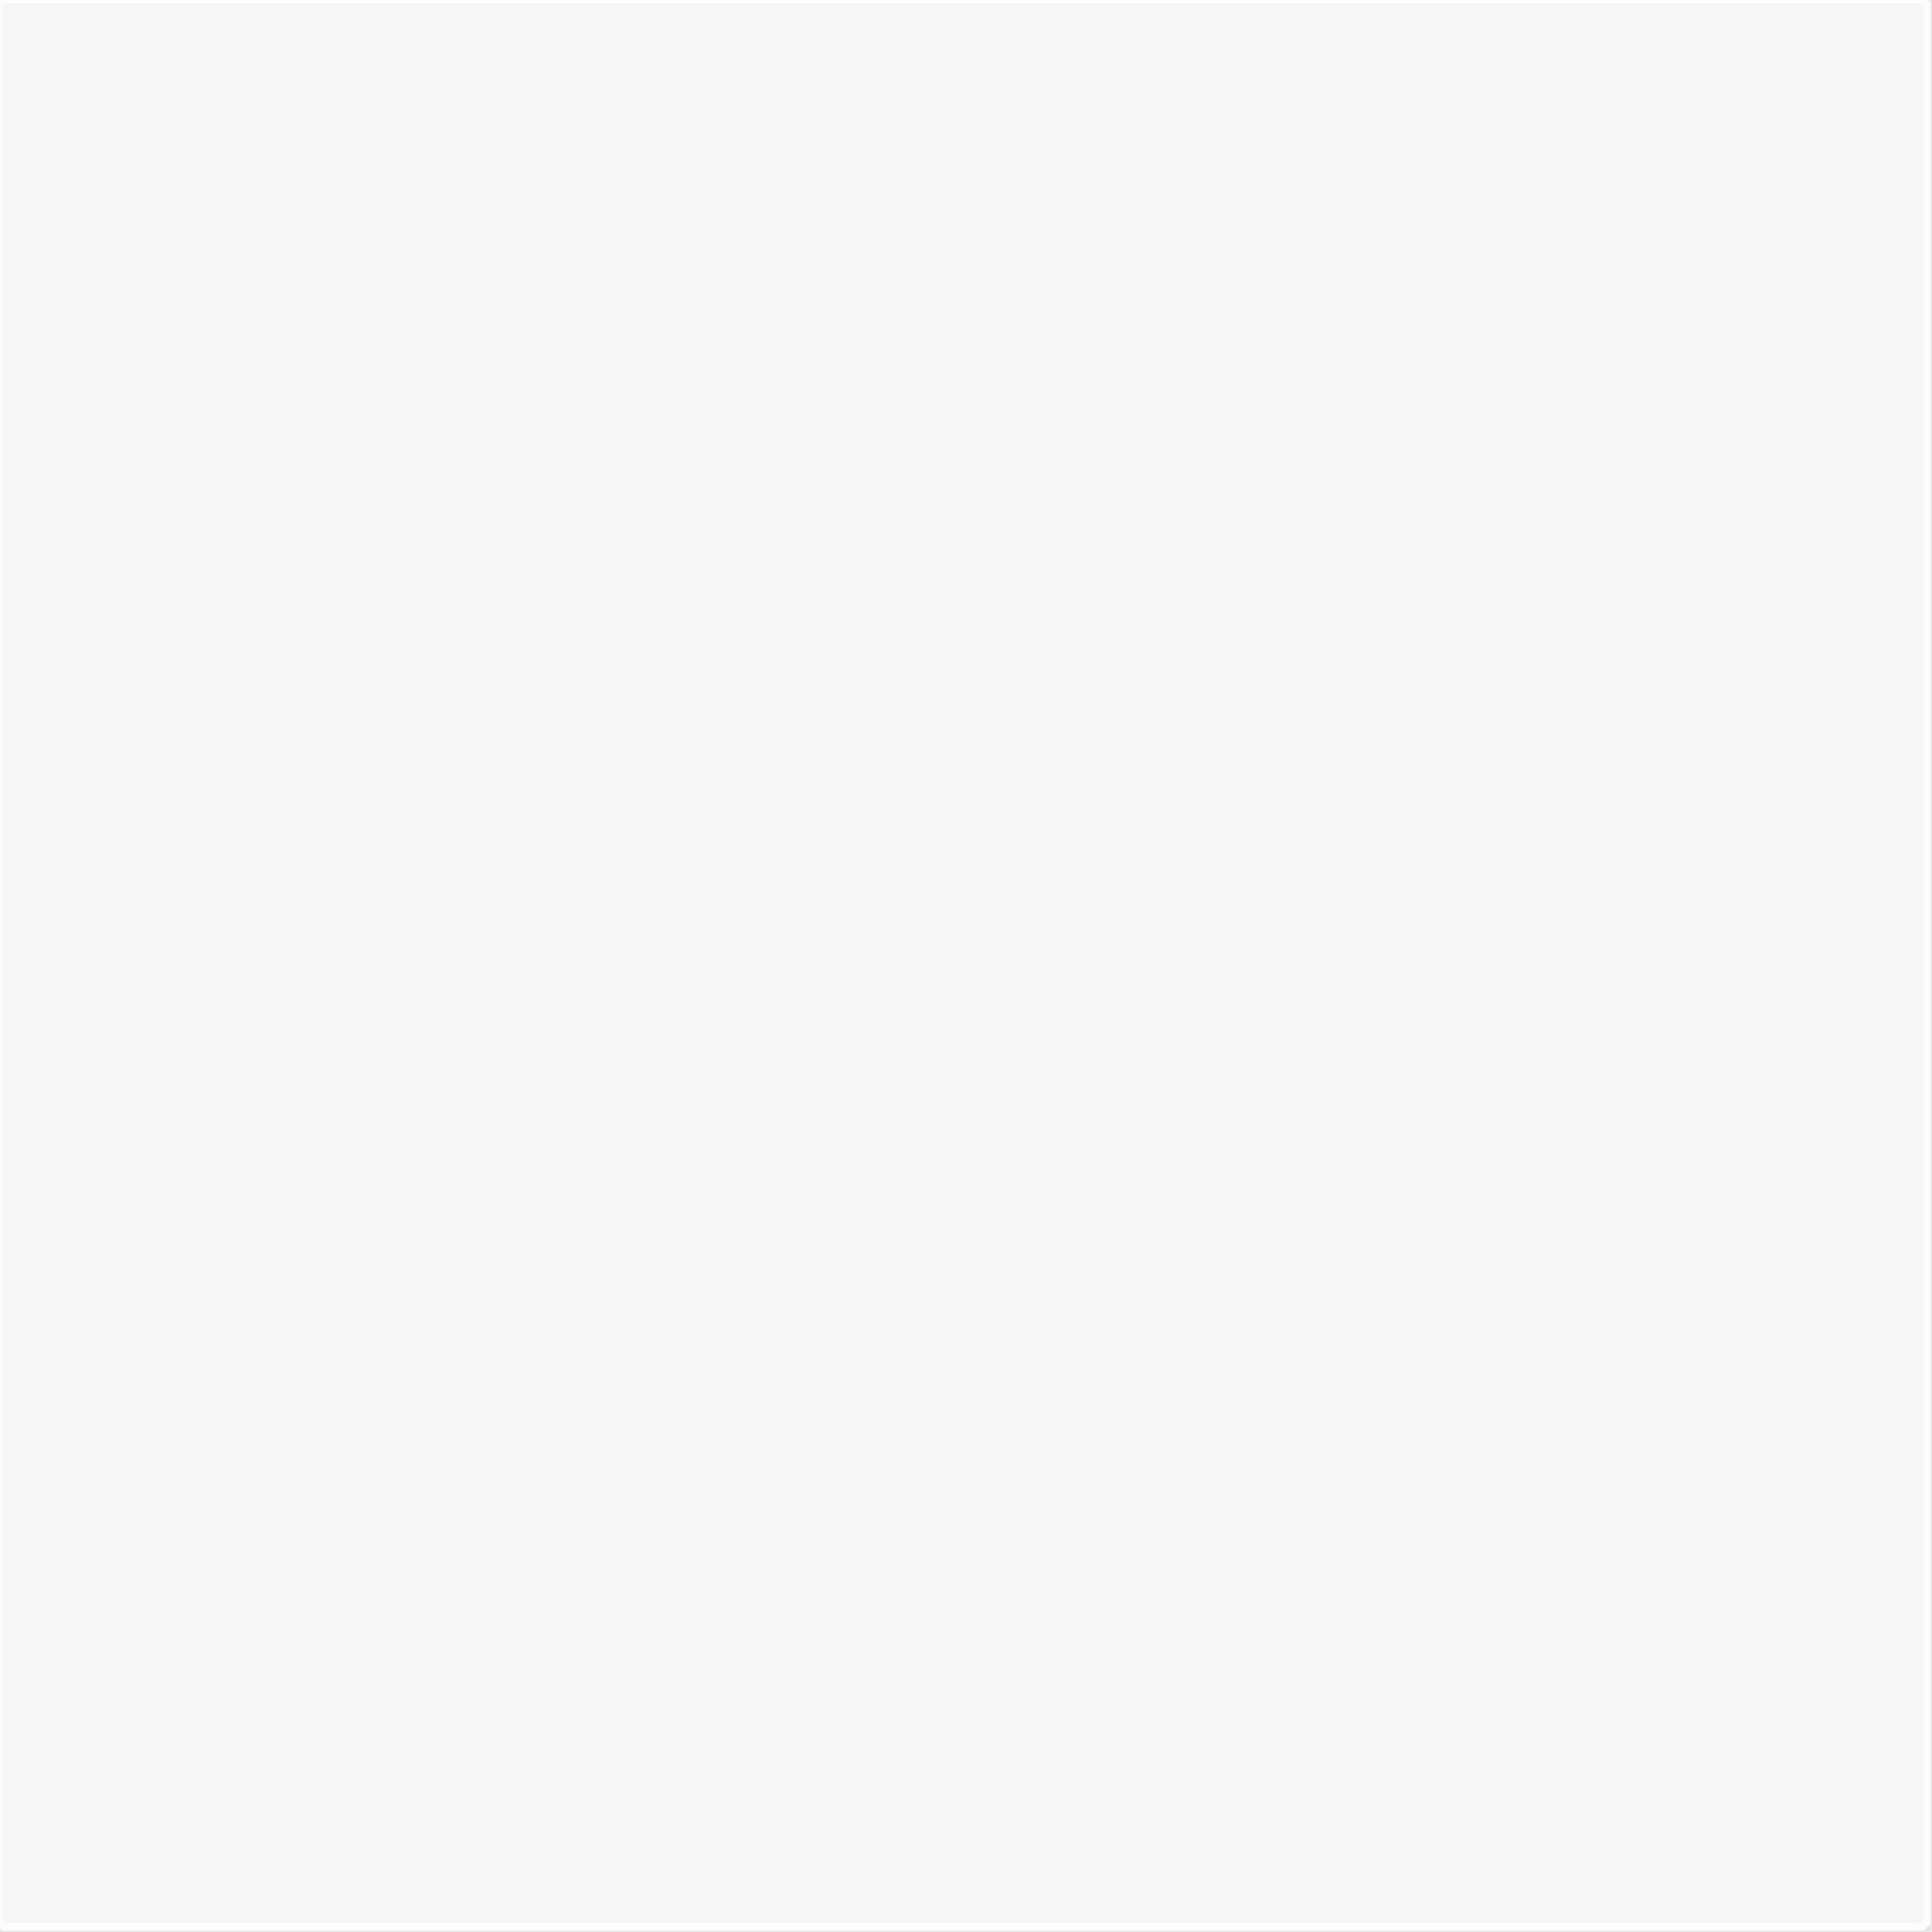 Carrelage moderne blanc neige mat rectifié 120x120cm INARI-R NIEVE - 1.44m² - zoom